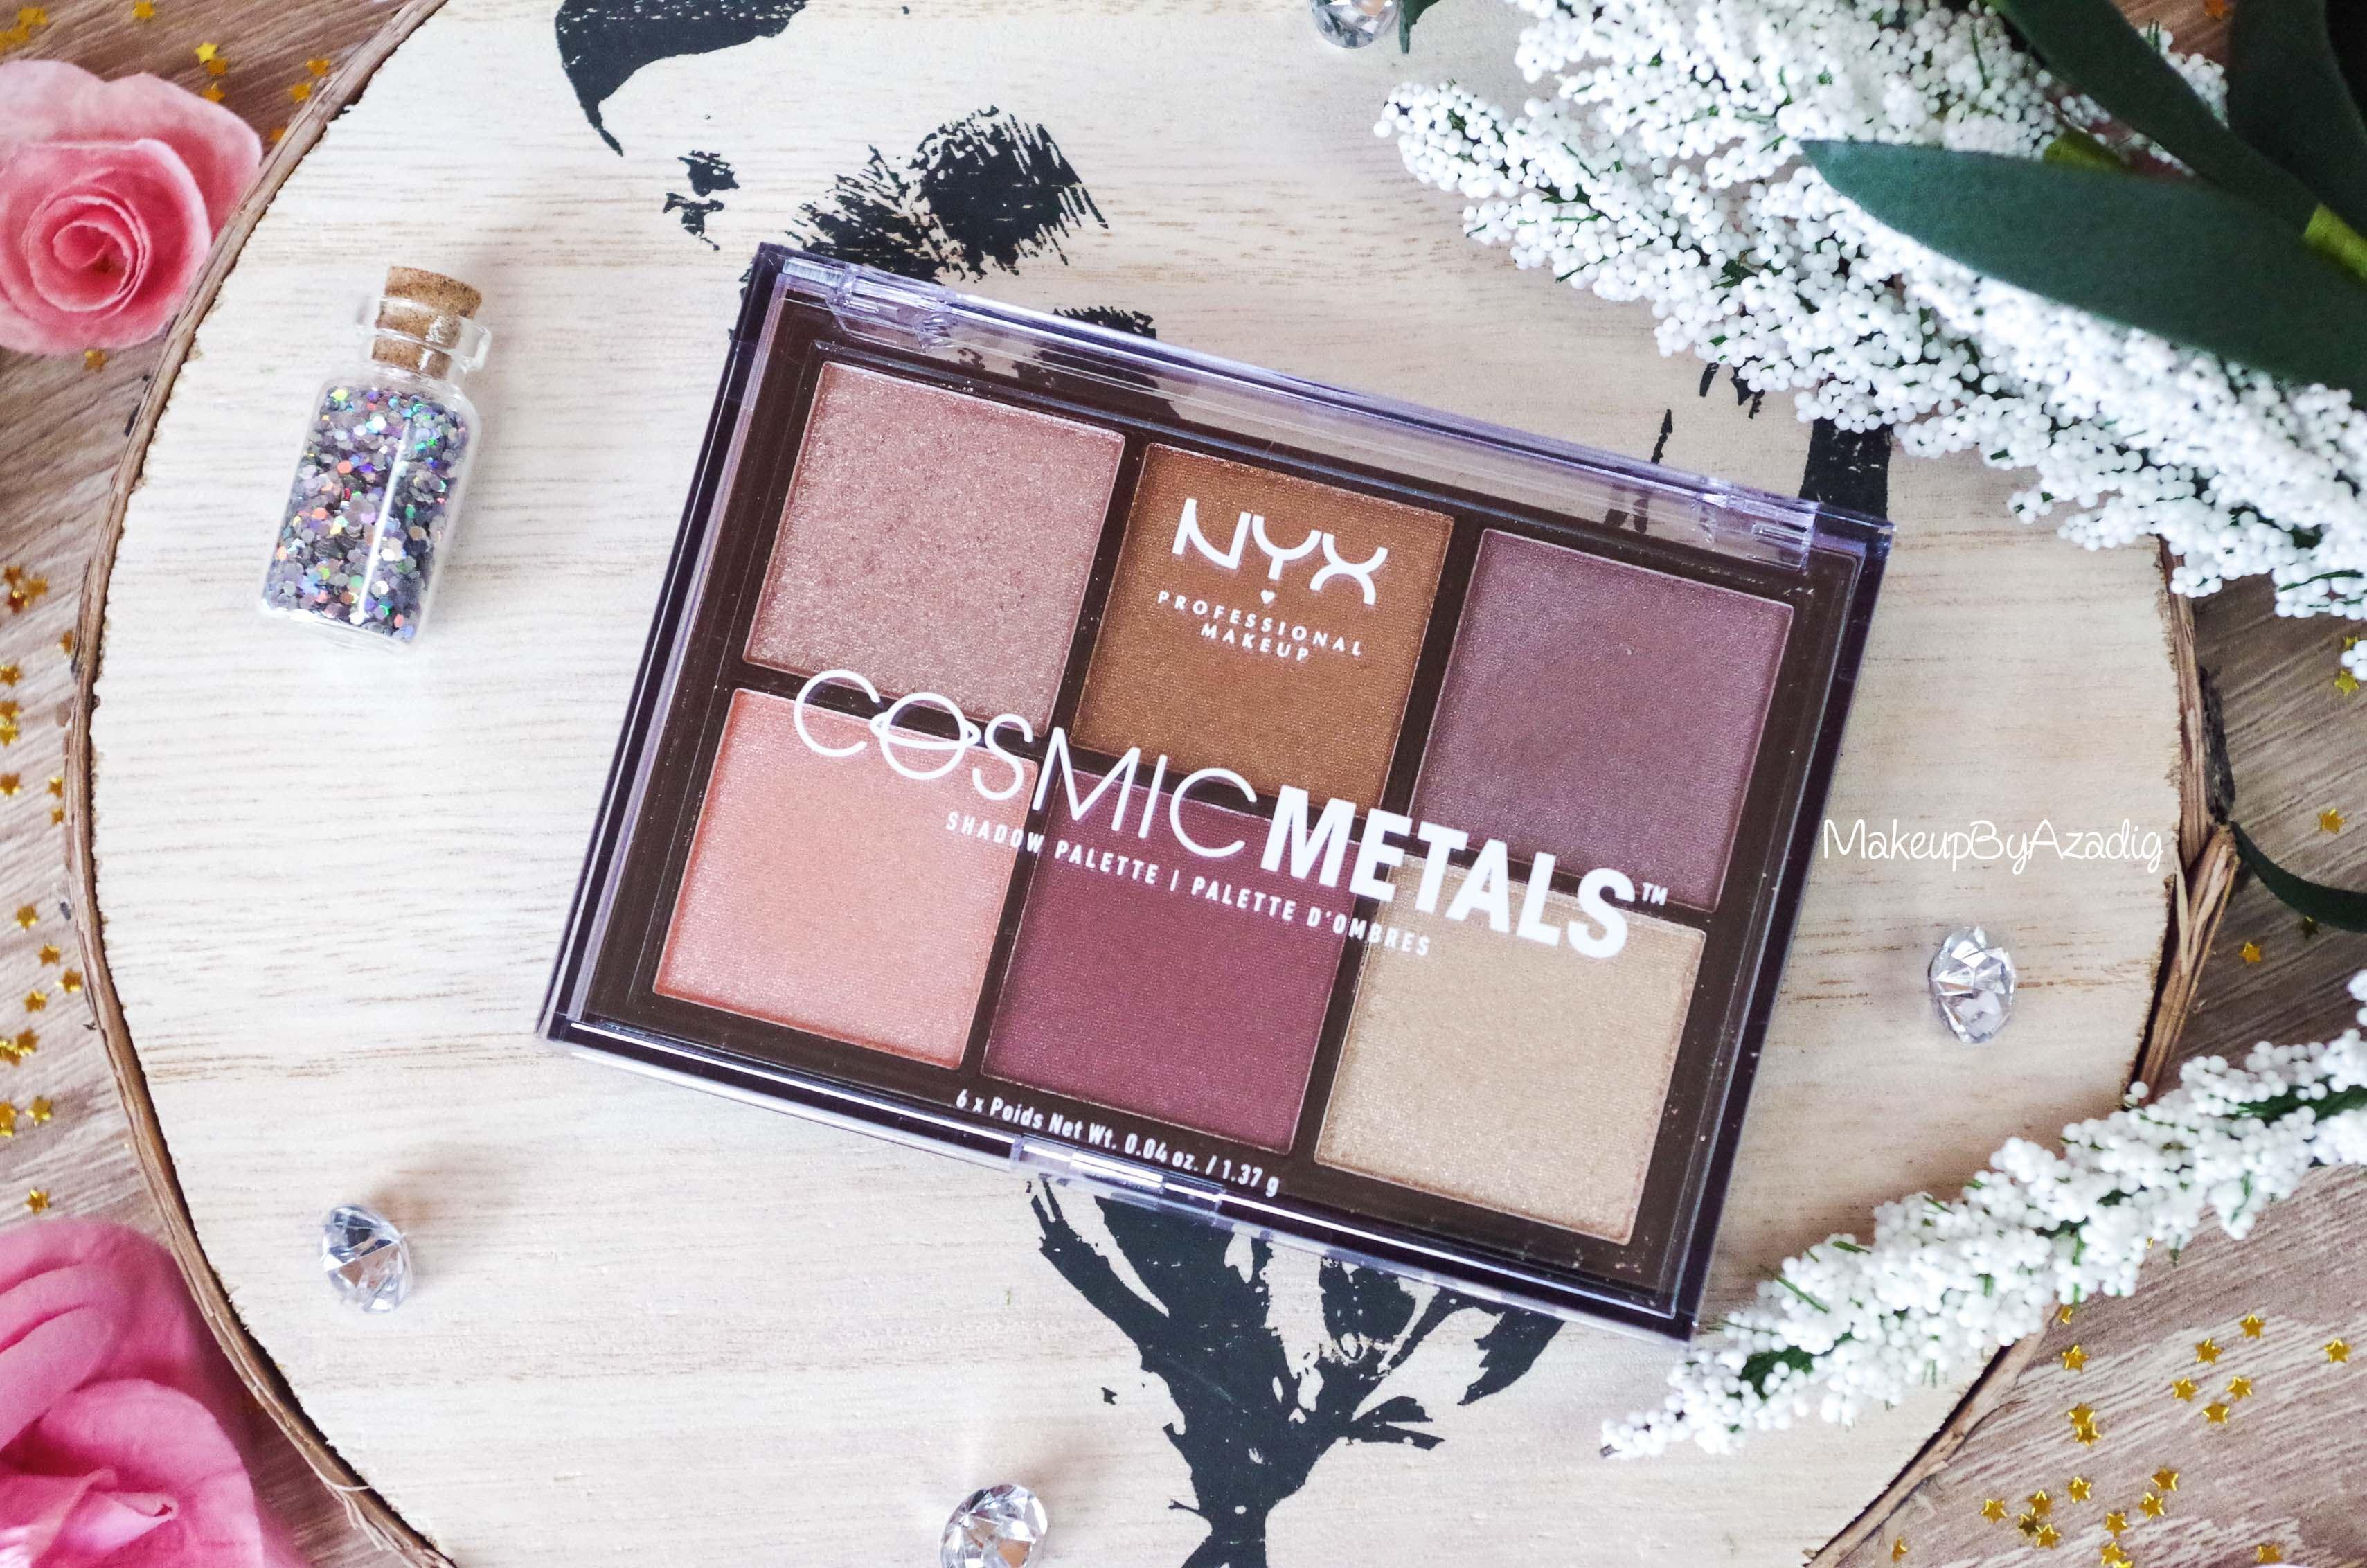 -revue-palette-fards-paupieres-cosmic-metals-nyx-cosmetics-pas-cher-meilleure-makeupbyazadig-influencer-automne